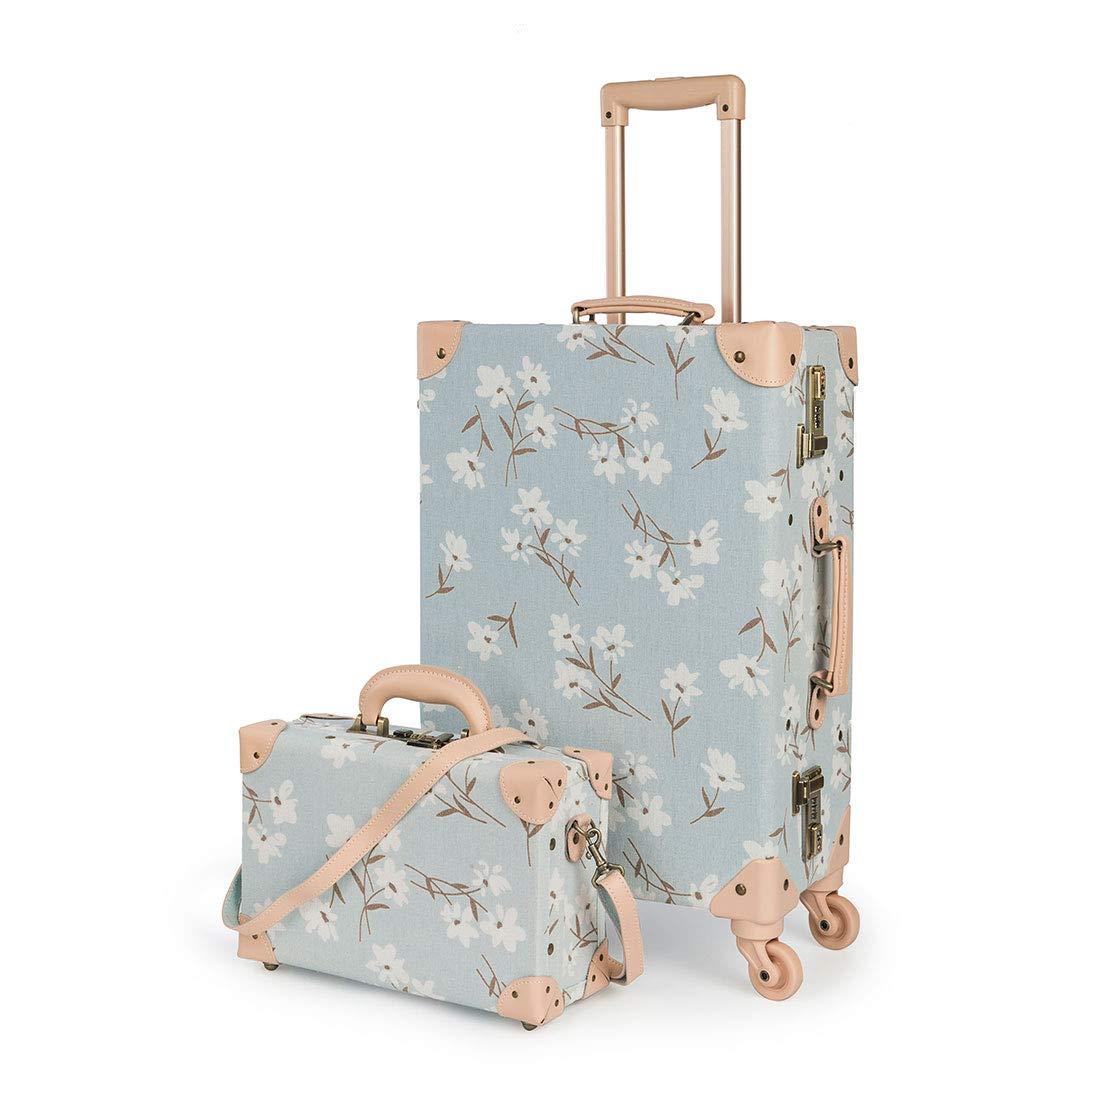 "COTRUNKAGE Cute Travel Luggage Set 2 Pcs Trunk Case Vintage Women Suitcase with TSA Lock (13"" & 26"", LightCyan Floral)"